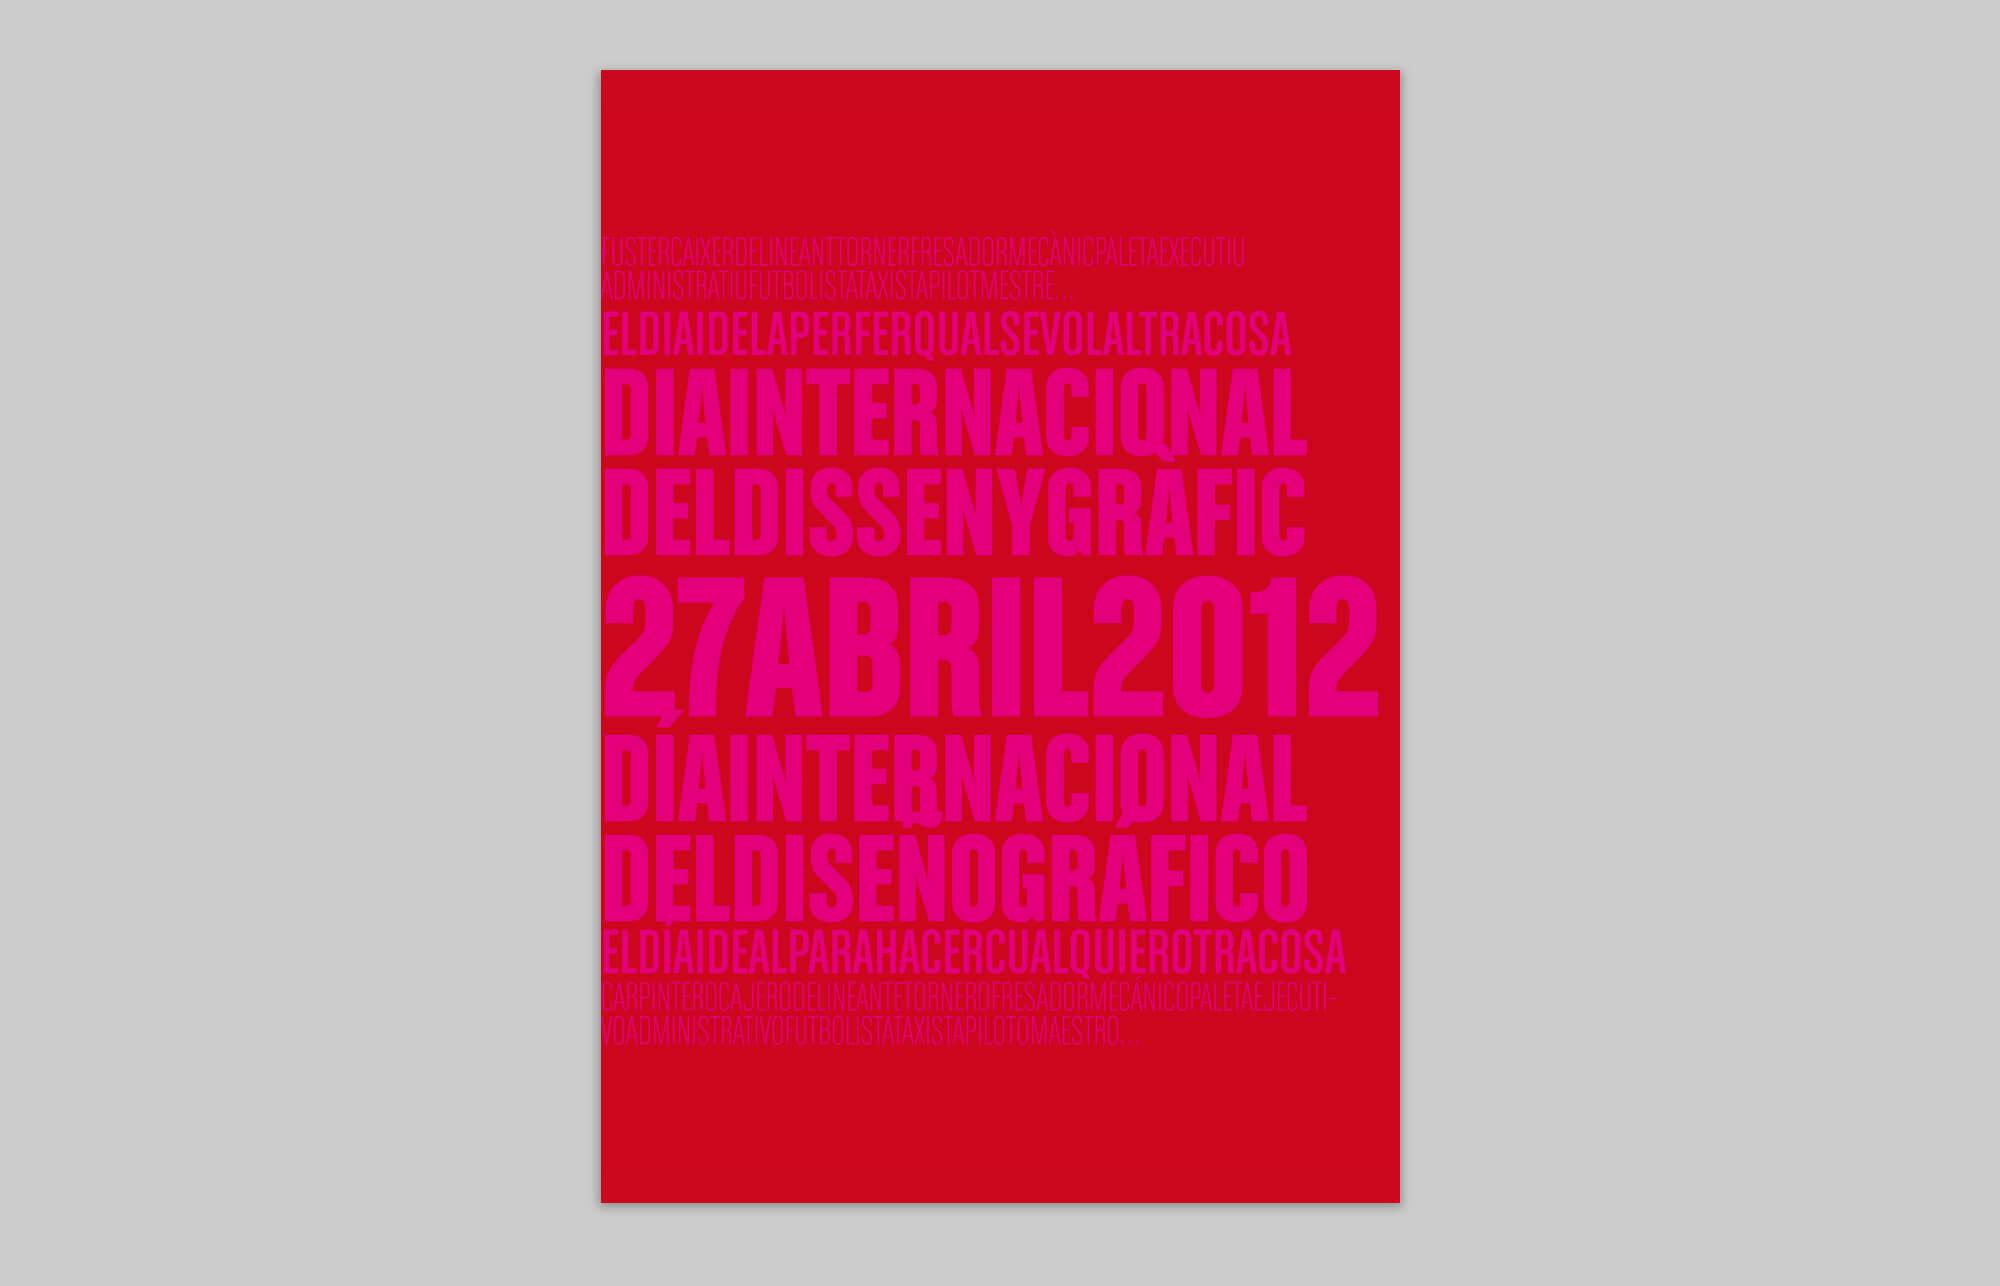 LN-DIADISSENYMUNDIAL-2012-1.jpg